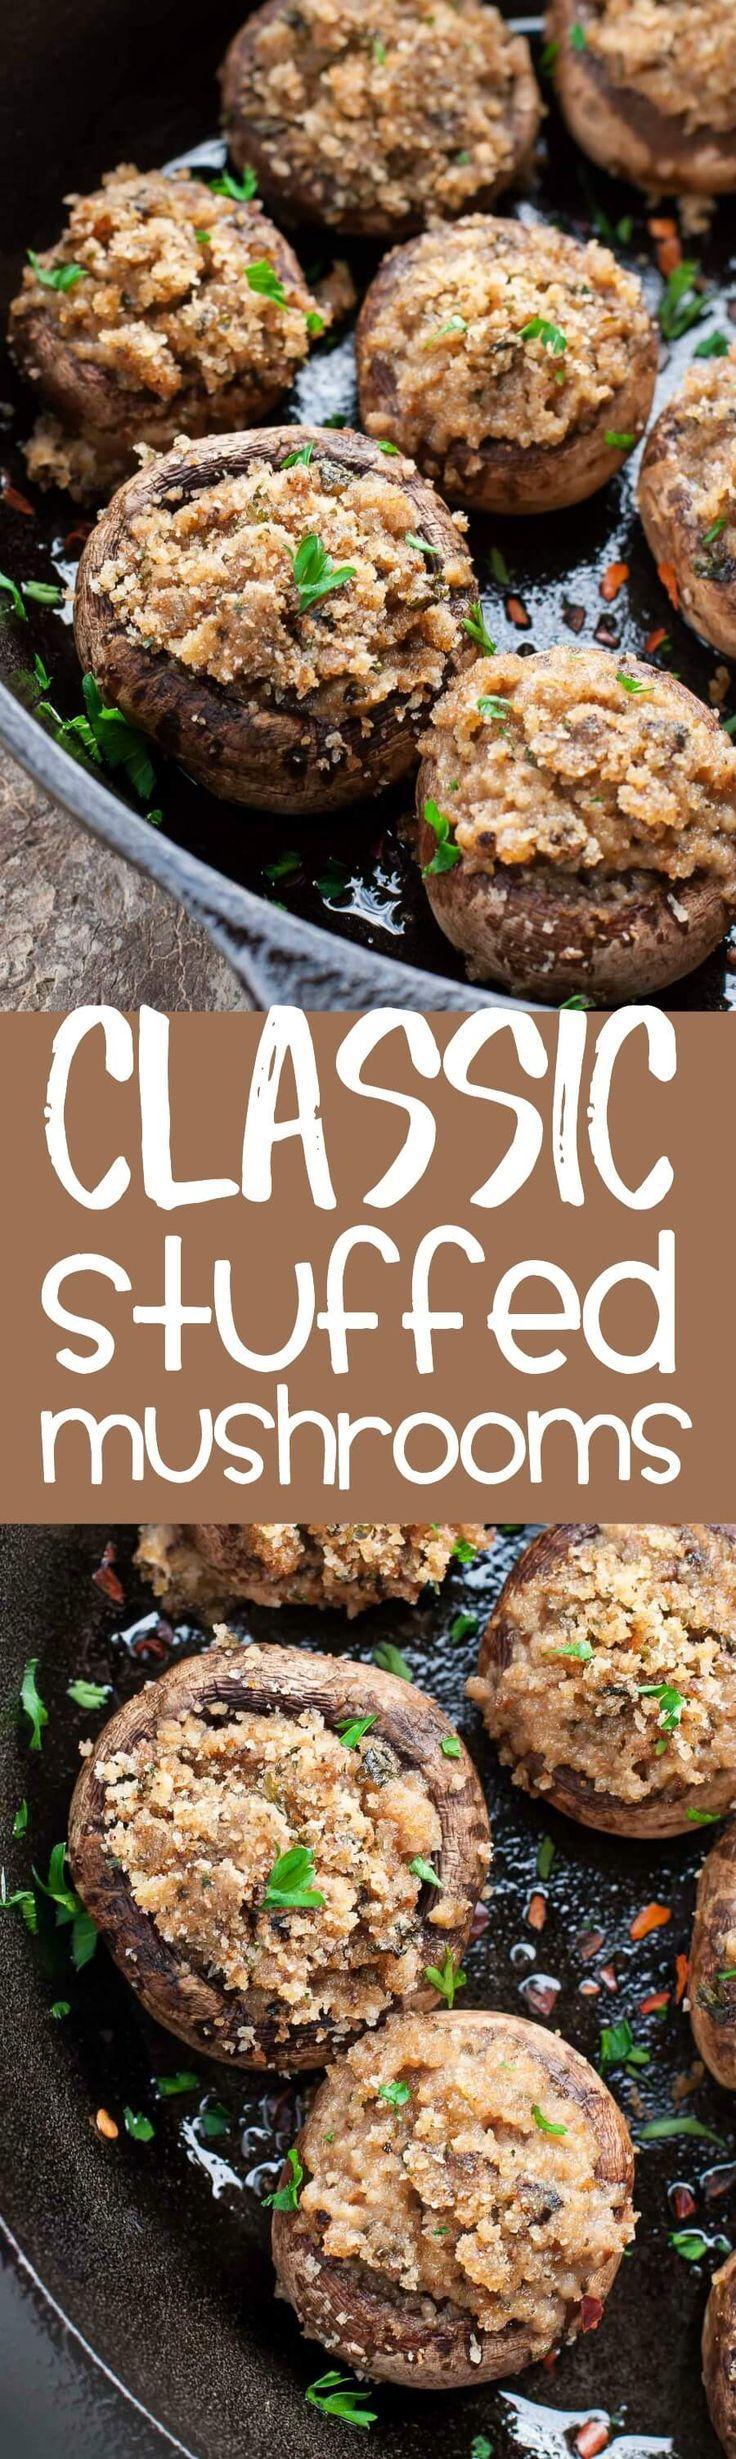 Classic Stuffed Mushrooms